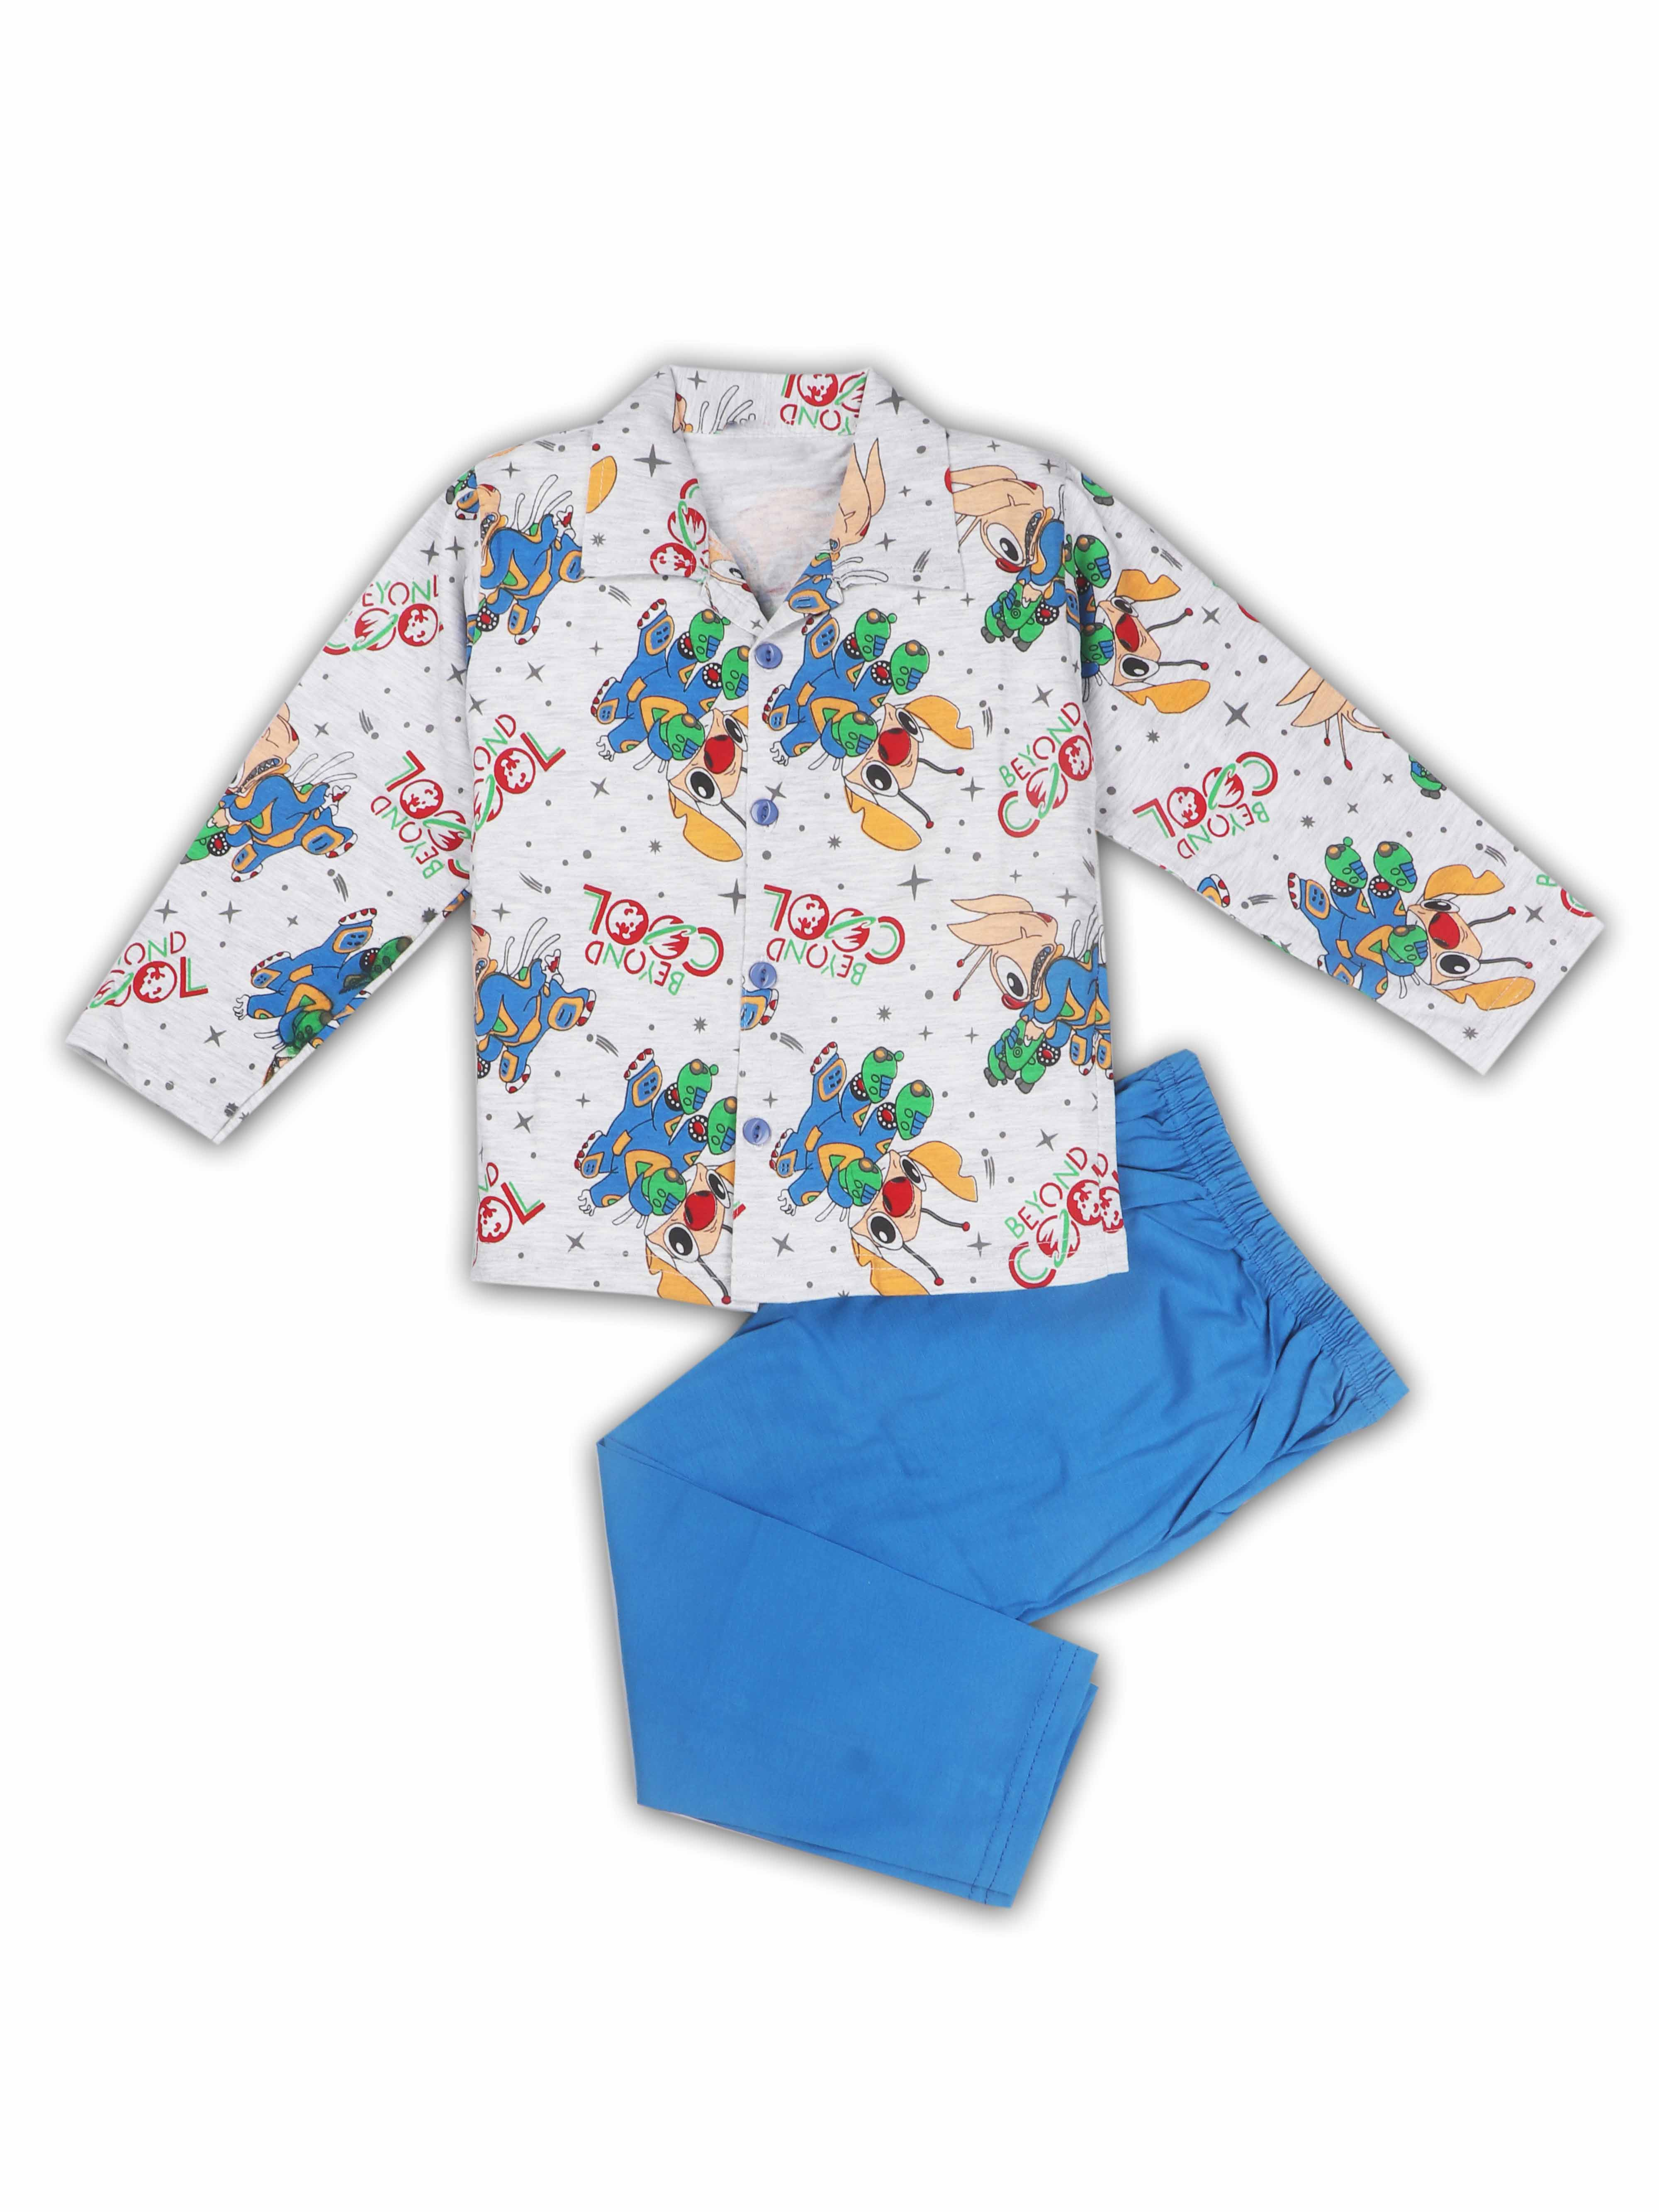 AAAKAR | AAAKAR Full Sleeves Night Suit All Over Print - Blue